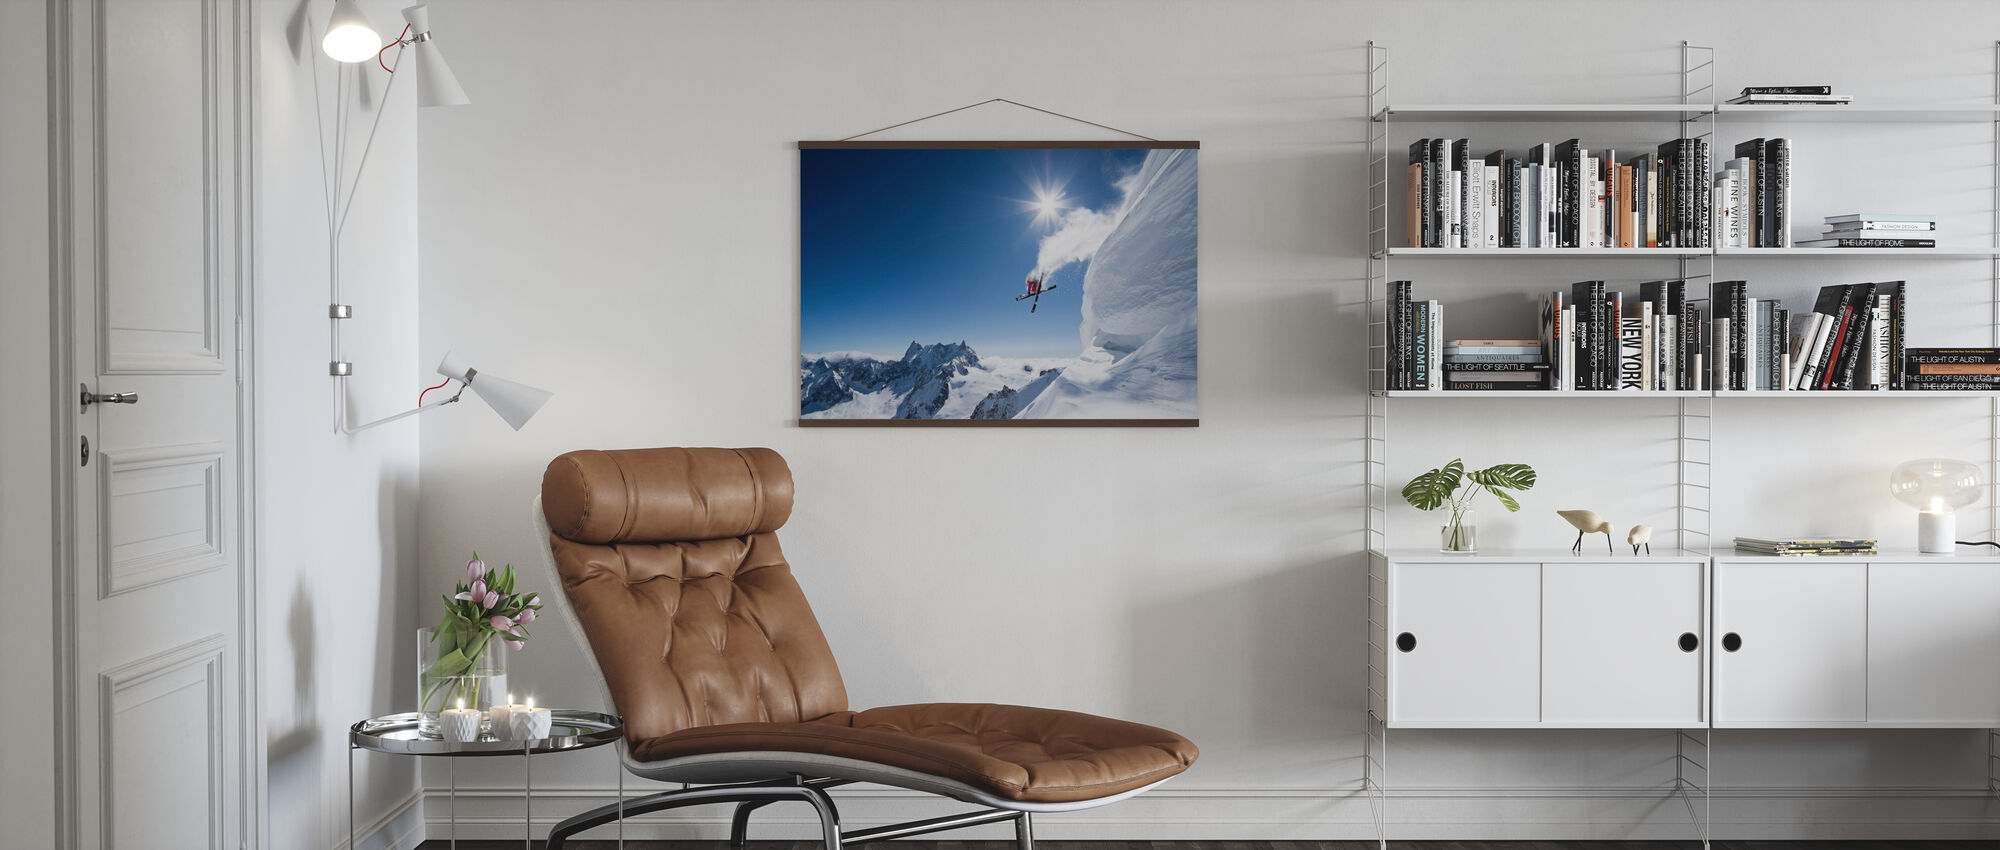 Extrem skidåkning - Poster - Vardagsrum